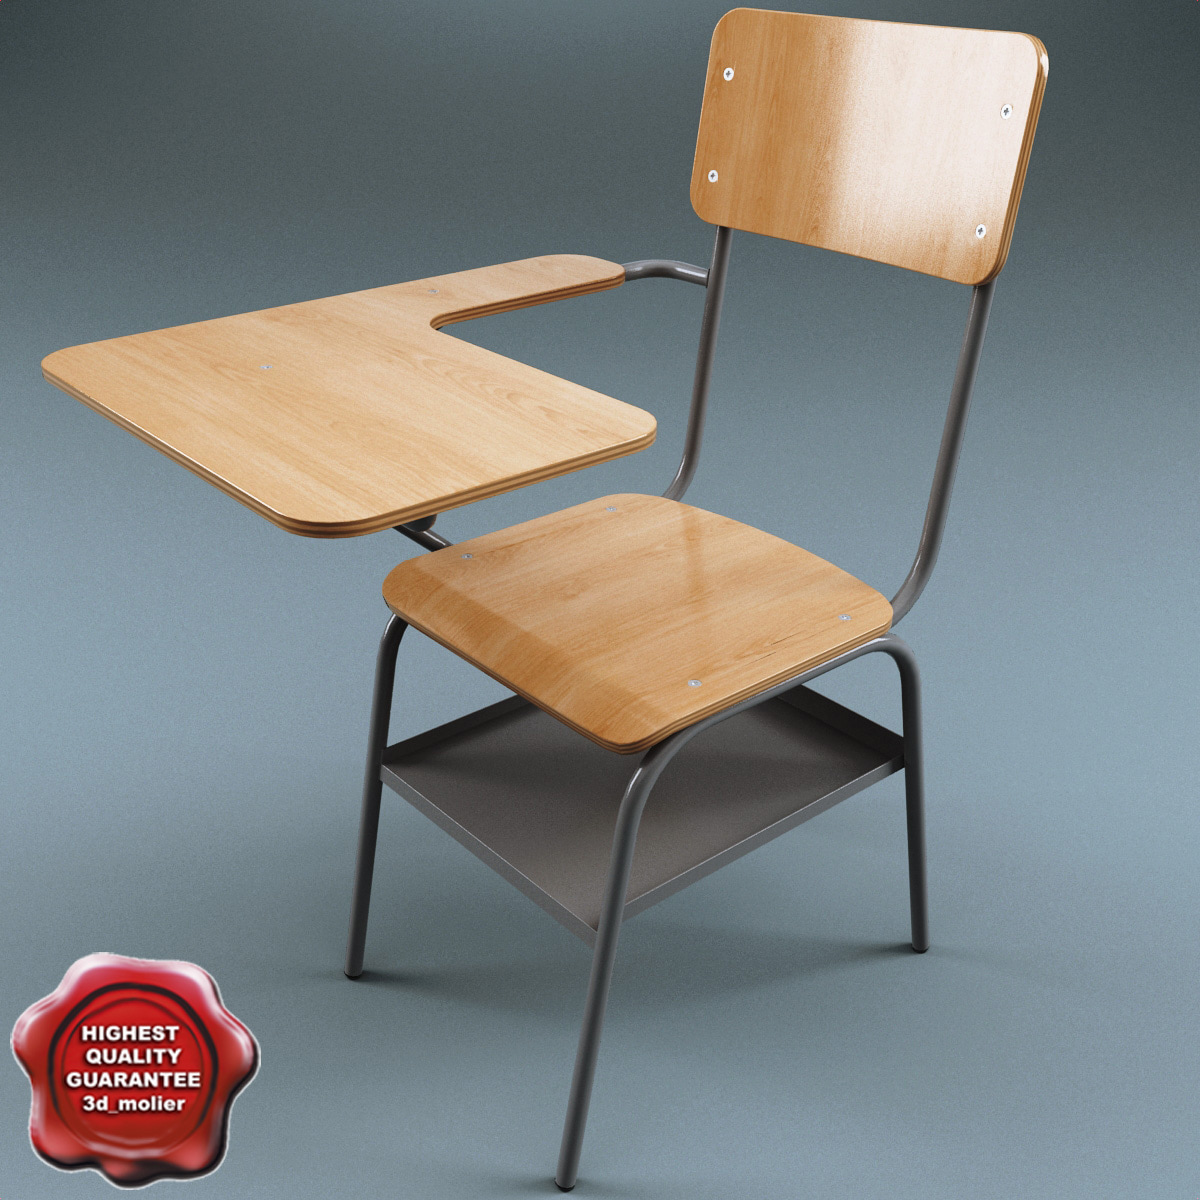 School_desk_V2_00.jpg